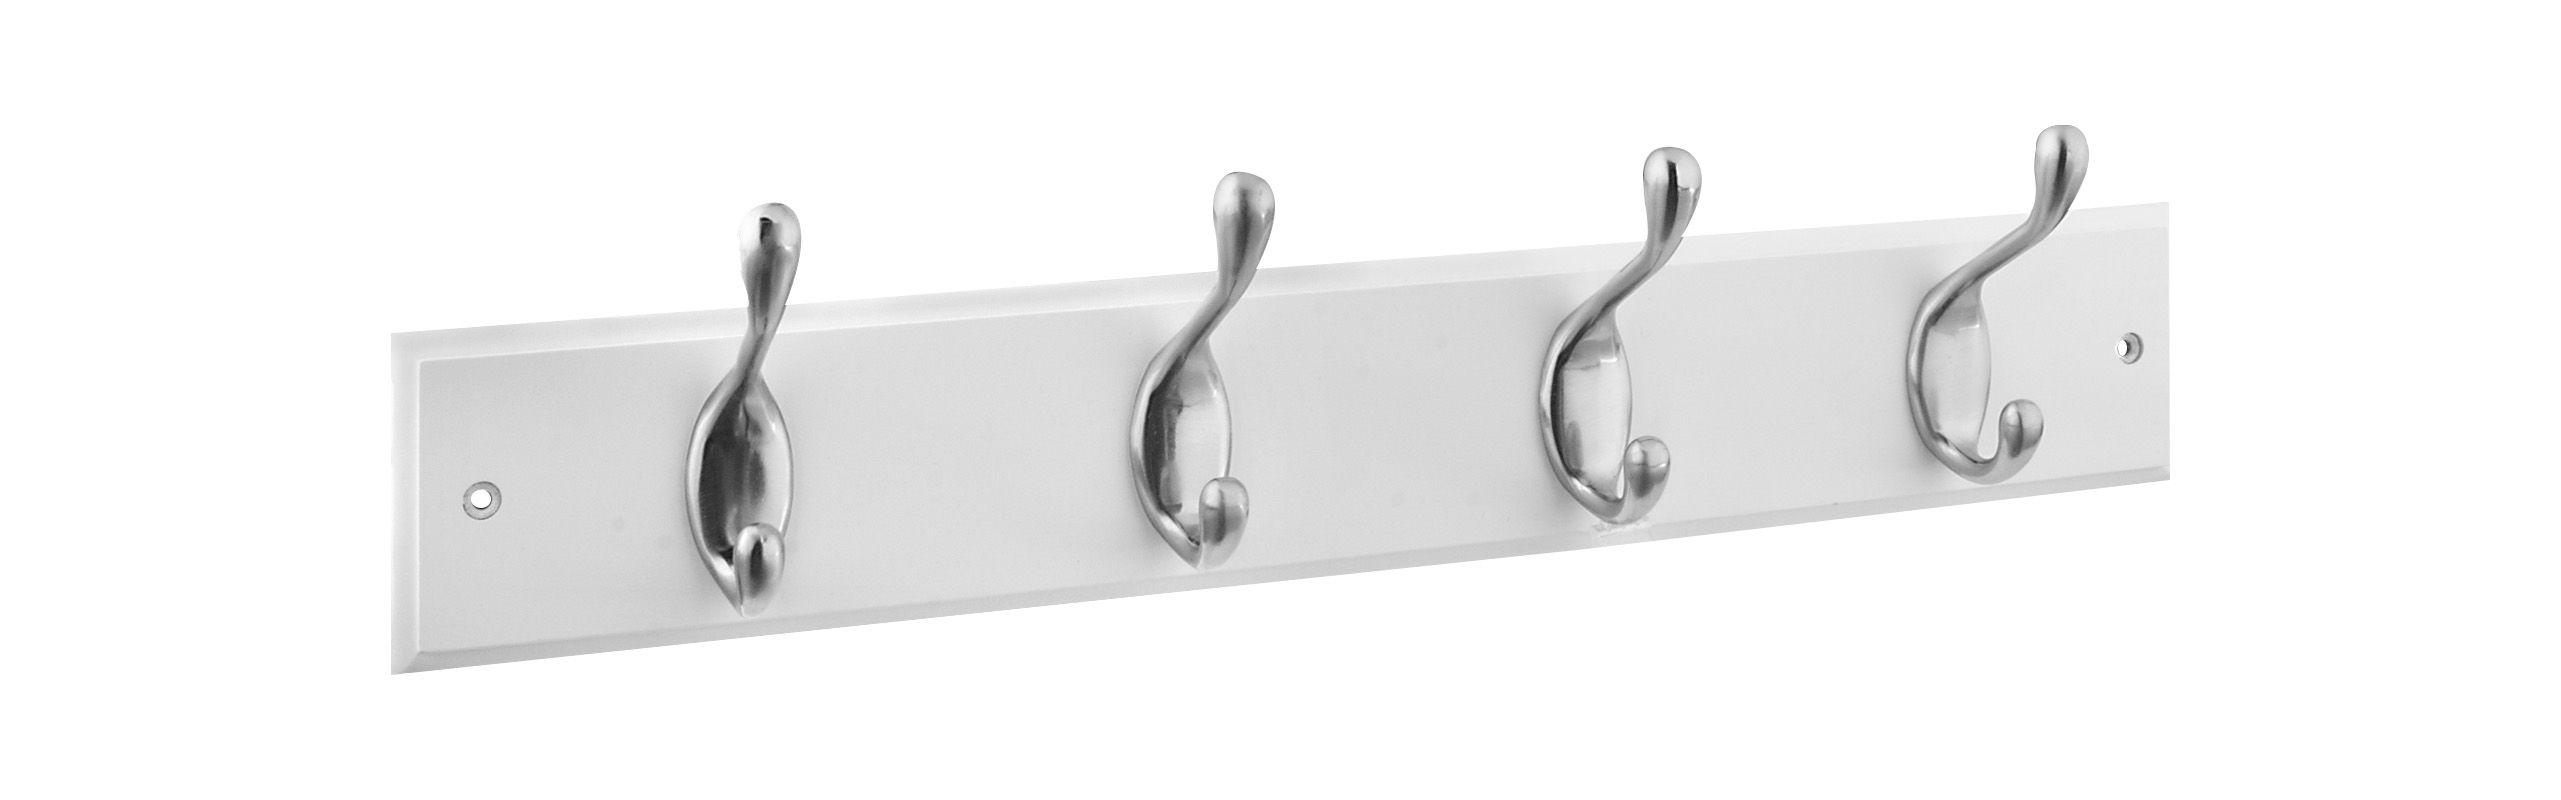 stanley home designs b8170snxwht satin nickel on white 18 inch long x